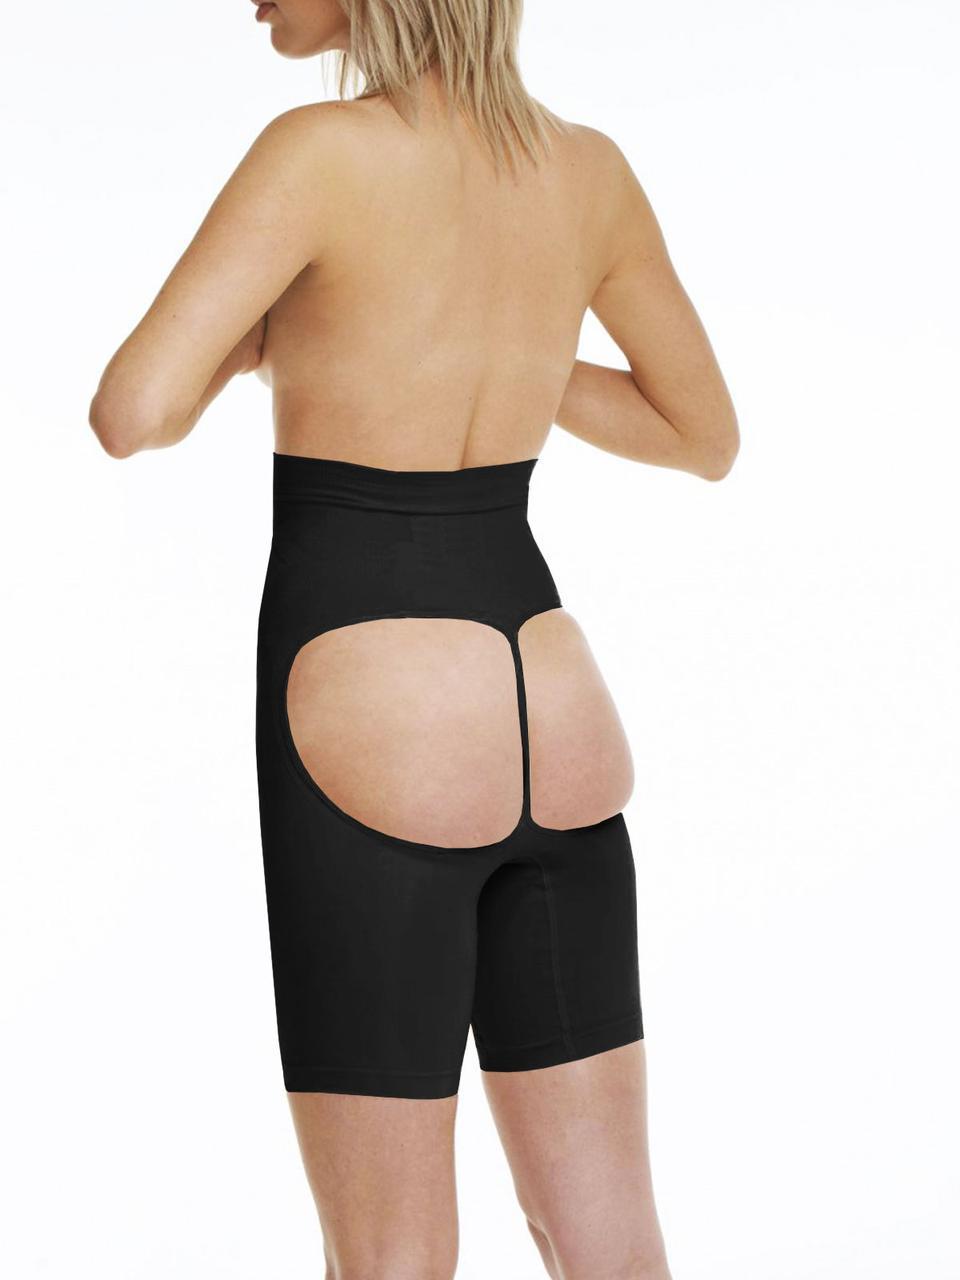 ce0017c587fdb Утягивающие шорты Push Up размер S M L XL корректирующее белье утяжка -  Apricot в Одессе